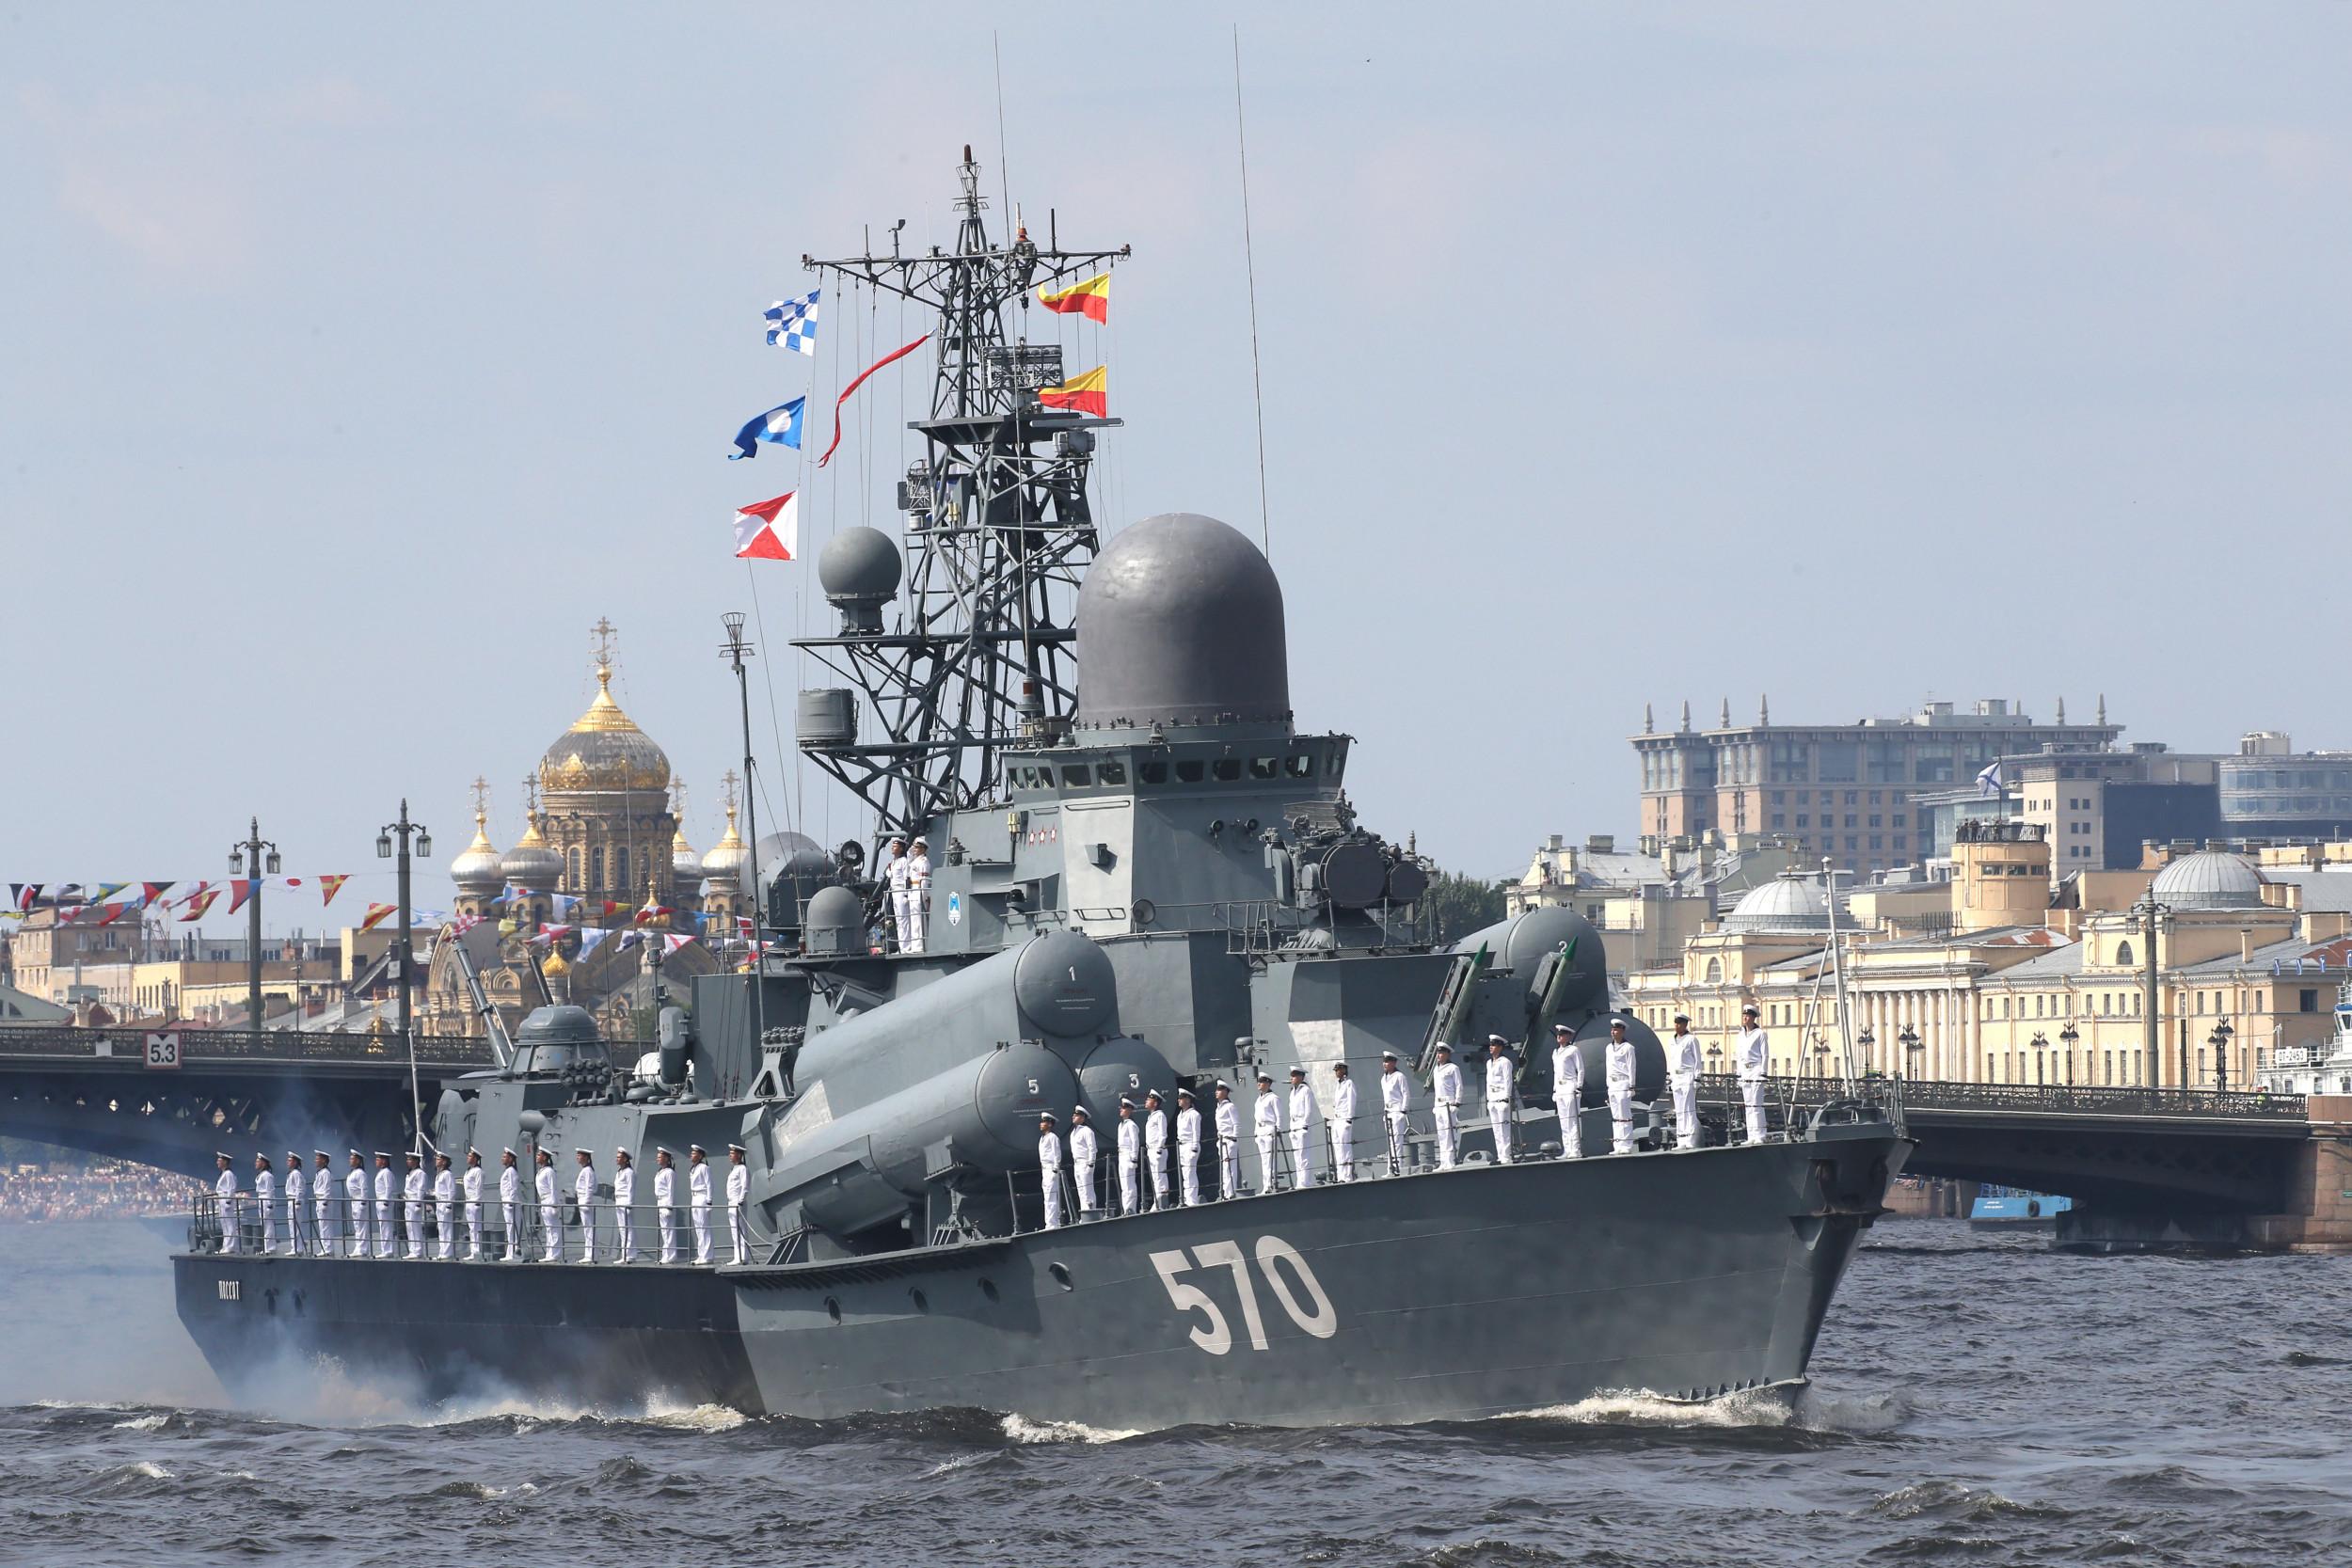 Russian Navy's Baltic Fleet transits Suez Canal